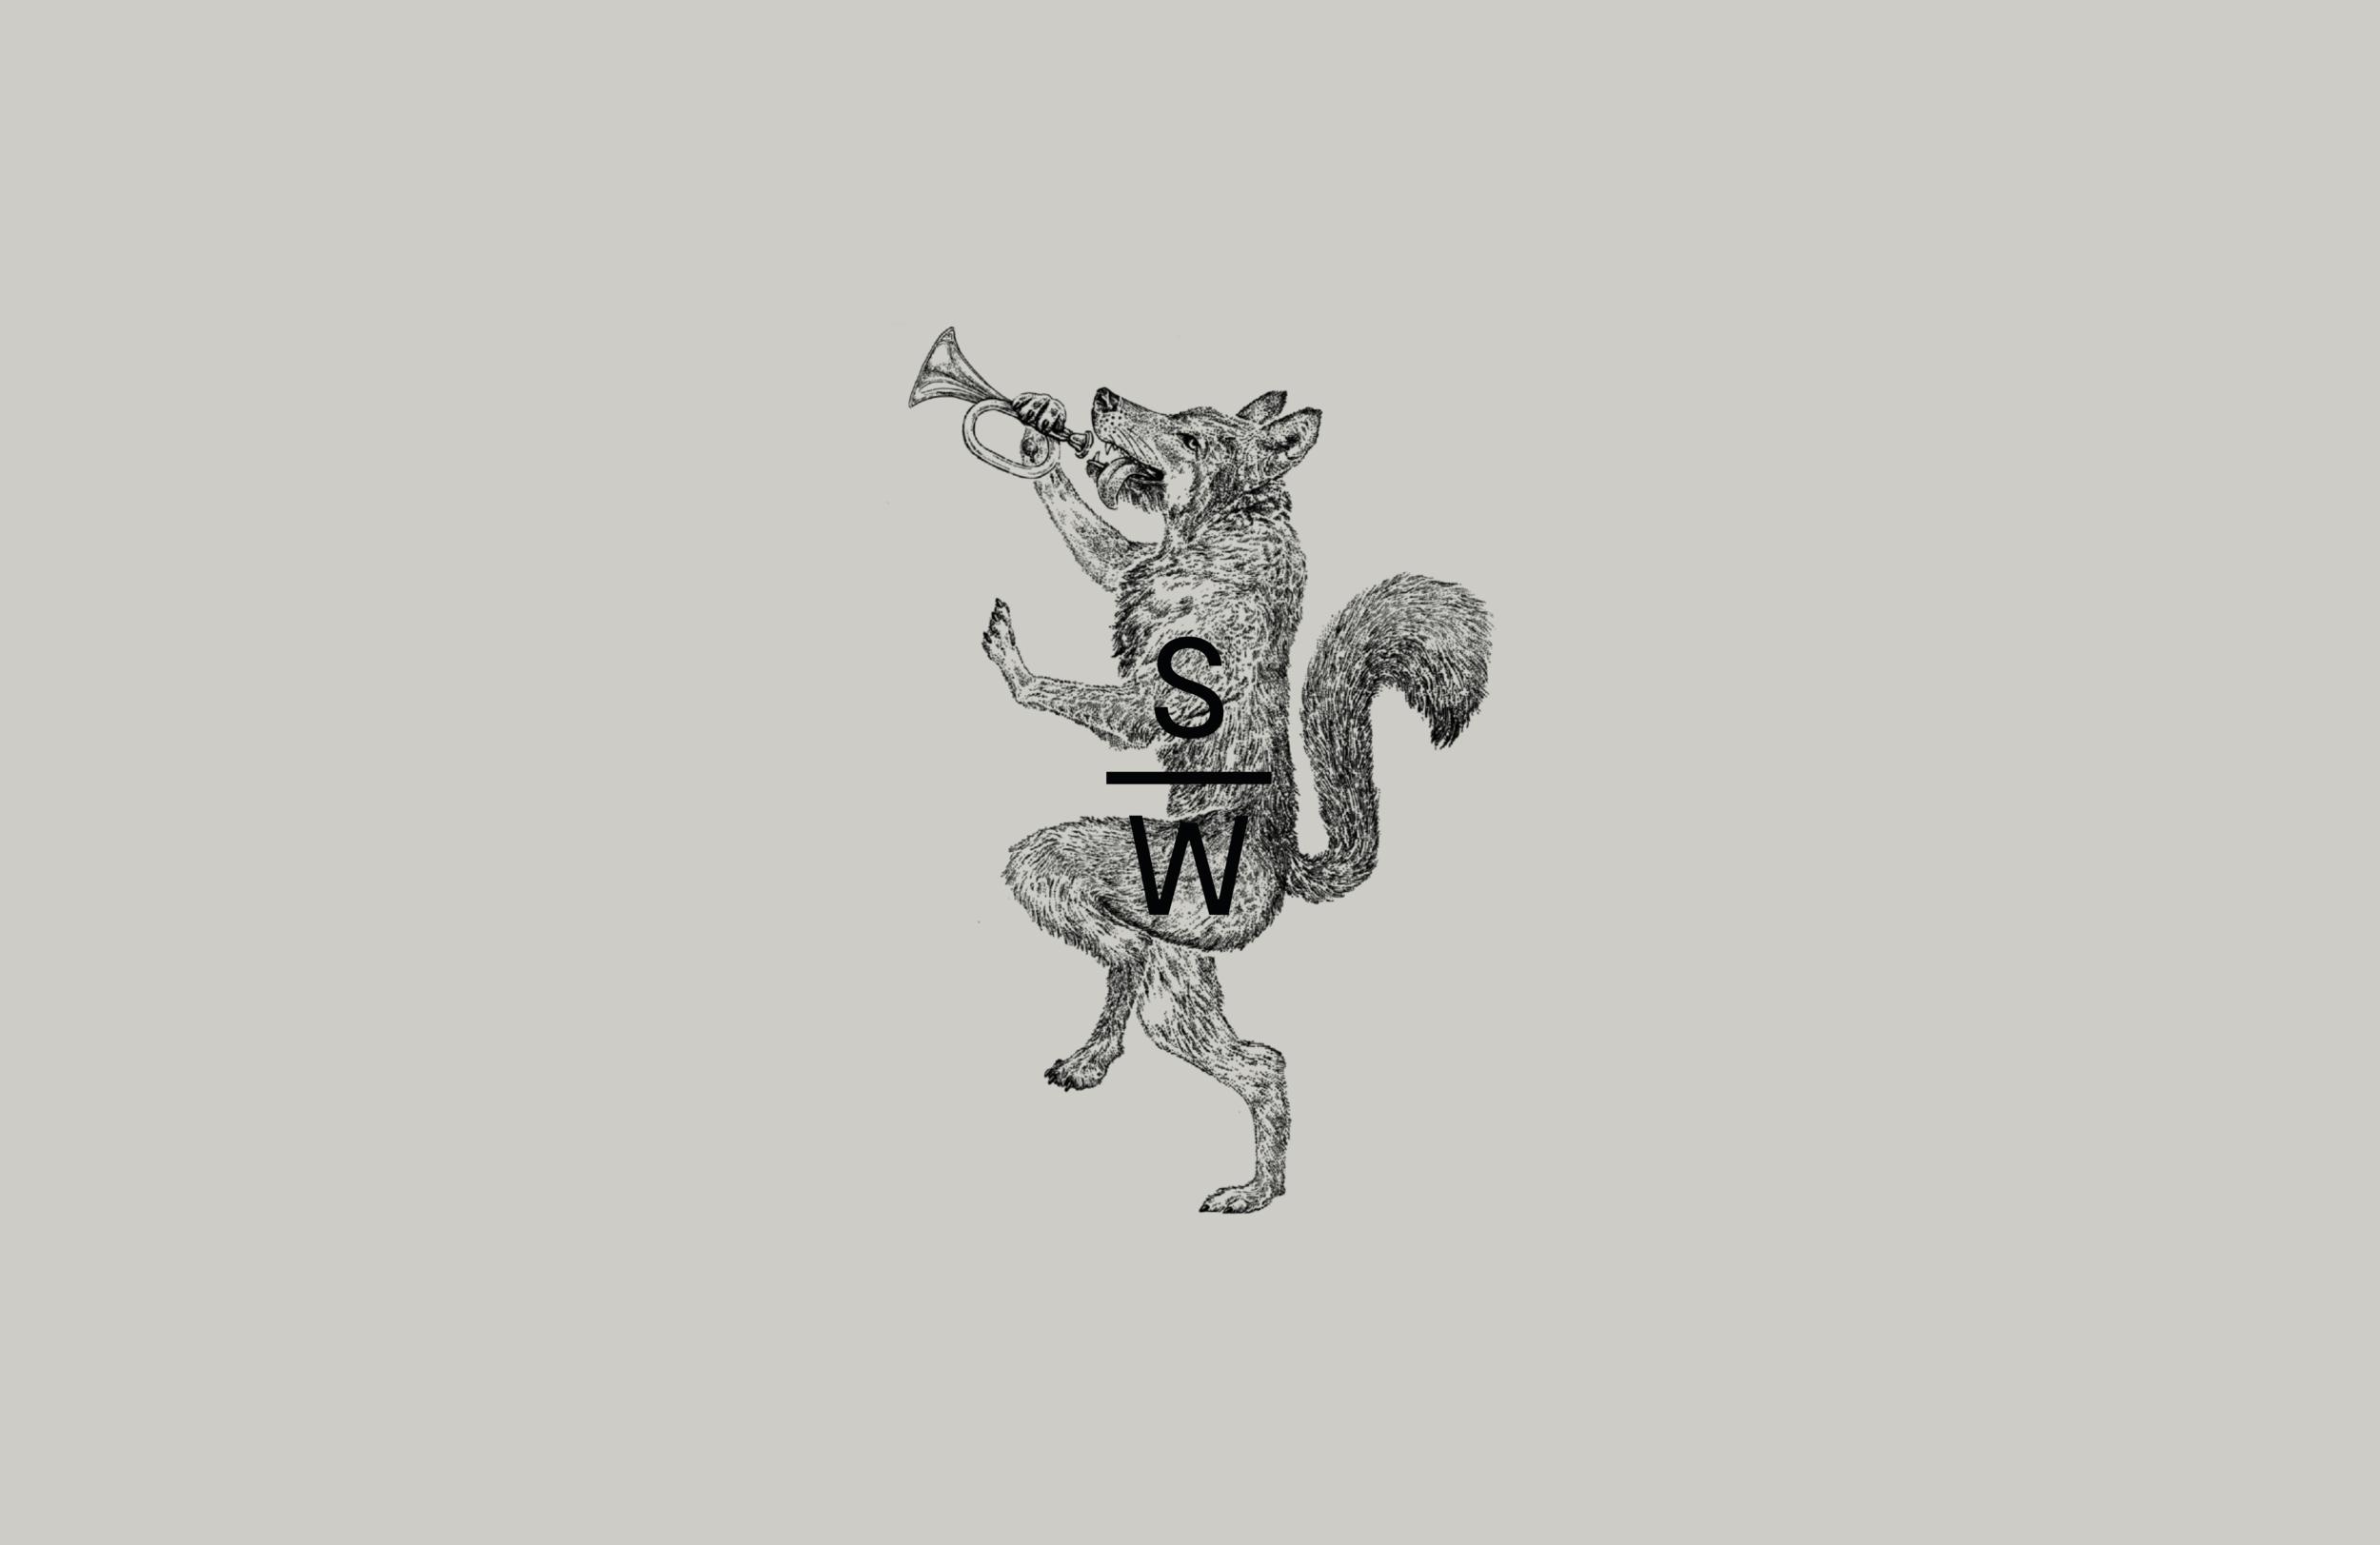 WolfSqaure+15@2x.png